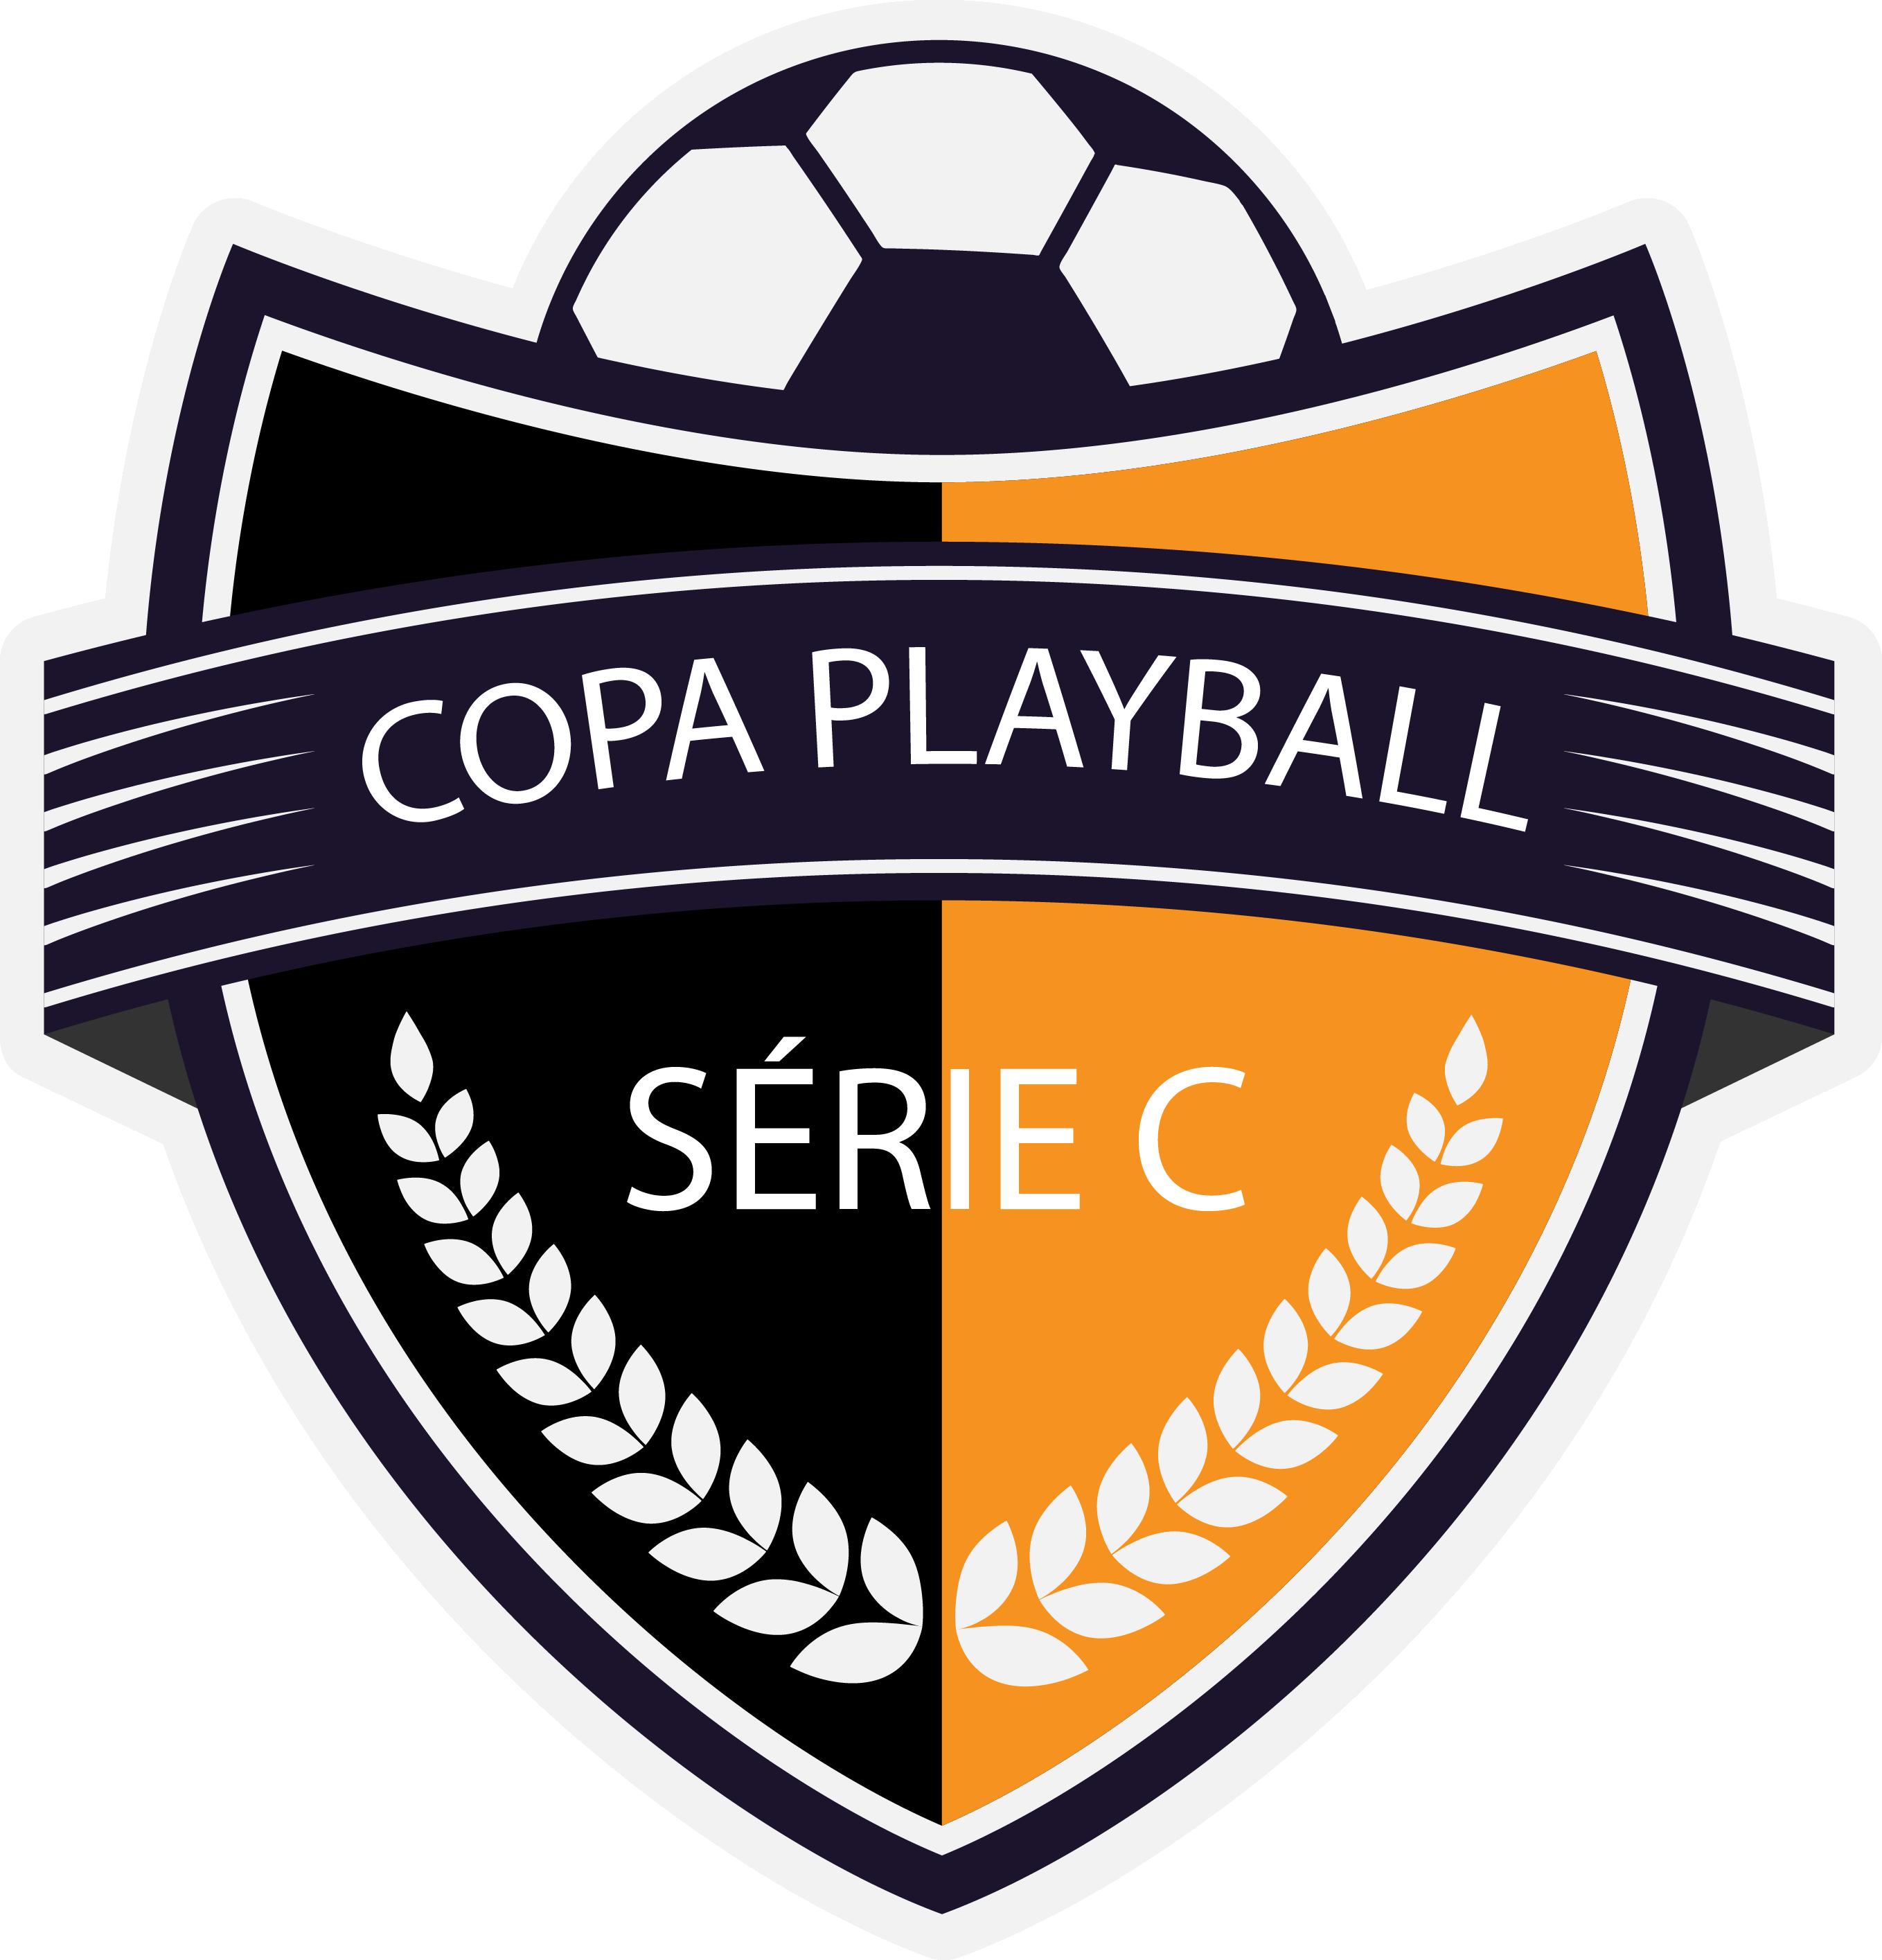 XII Copa Playball: Série C